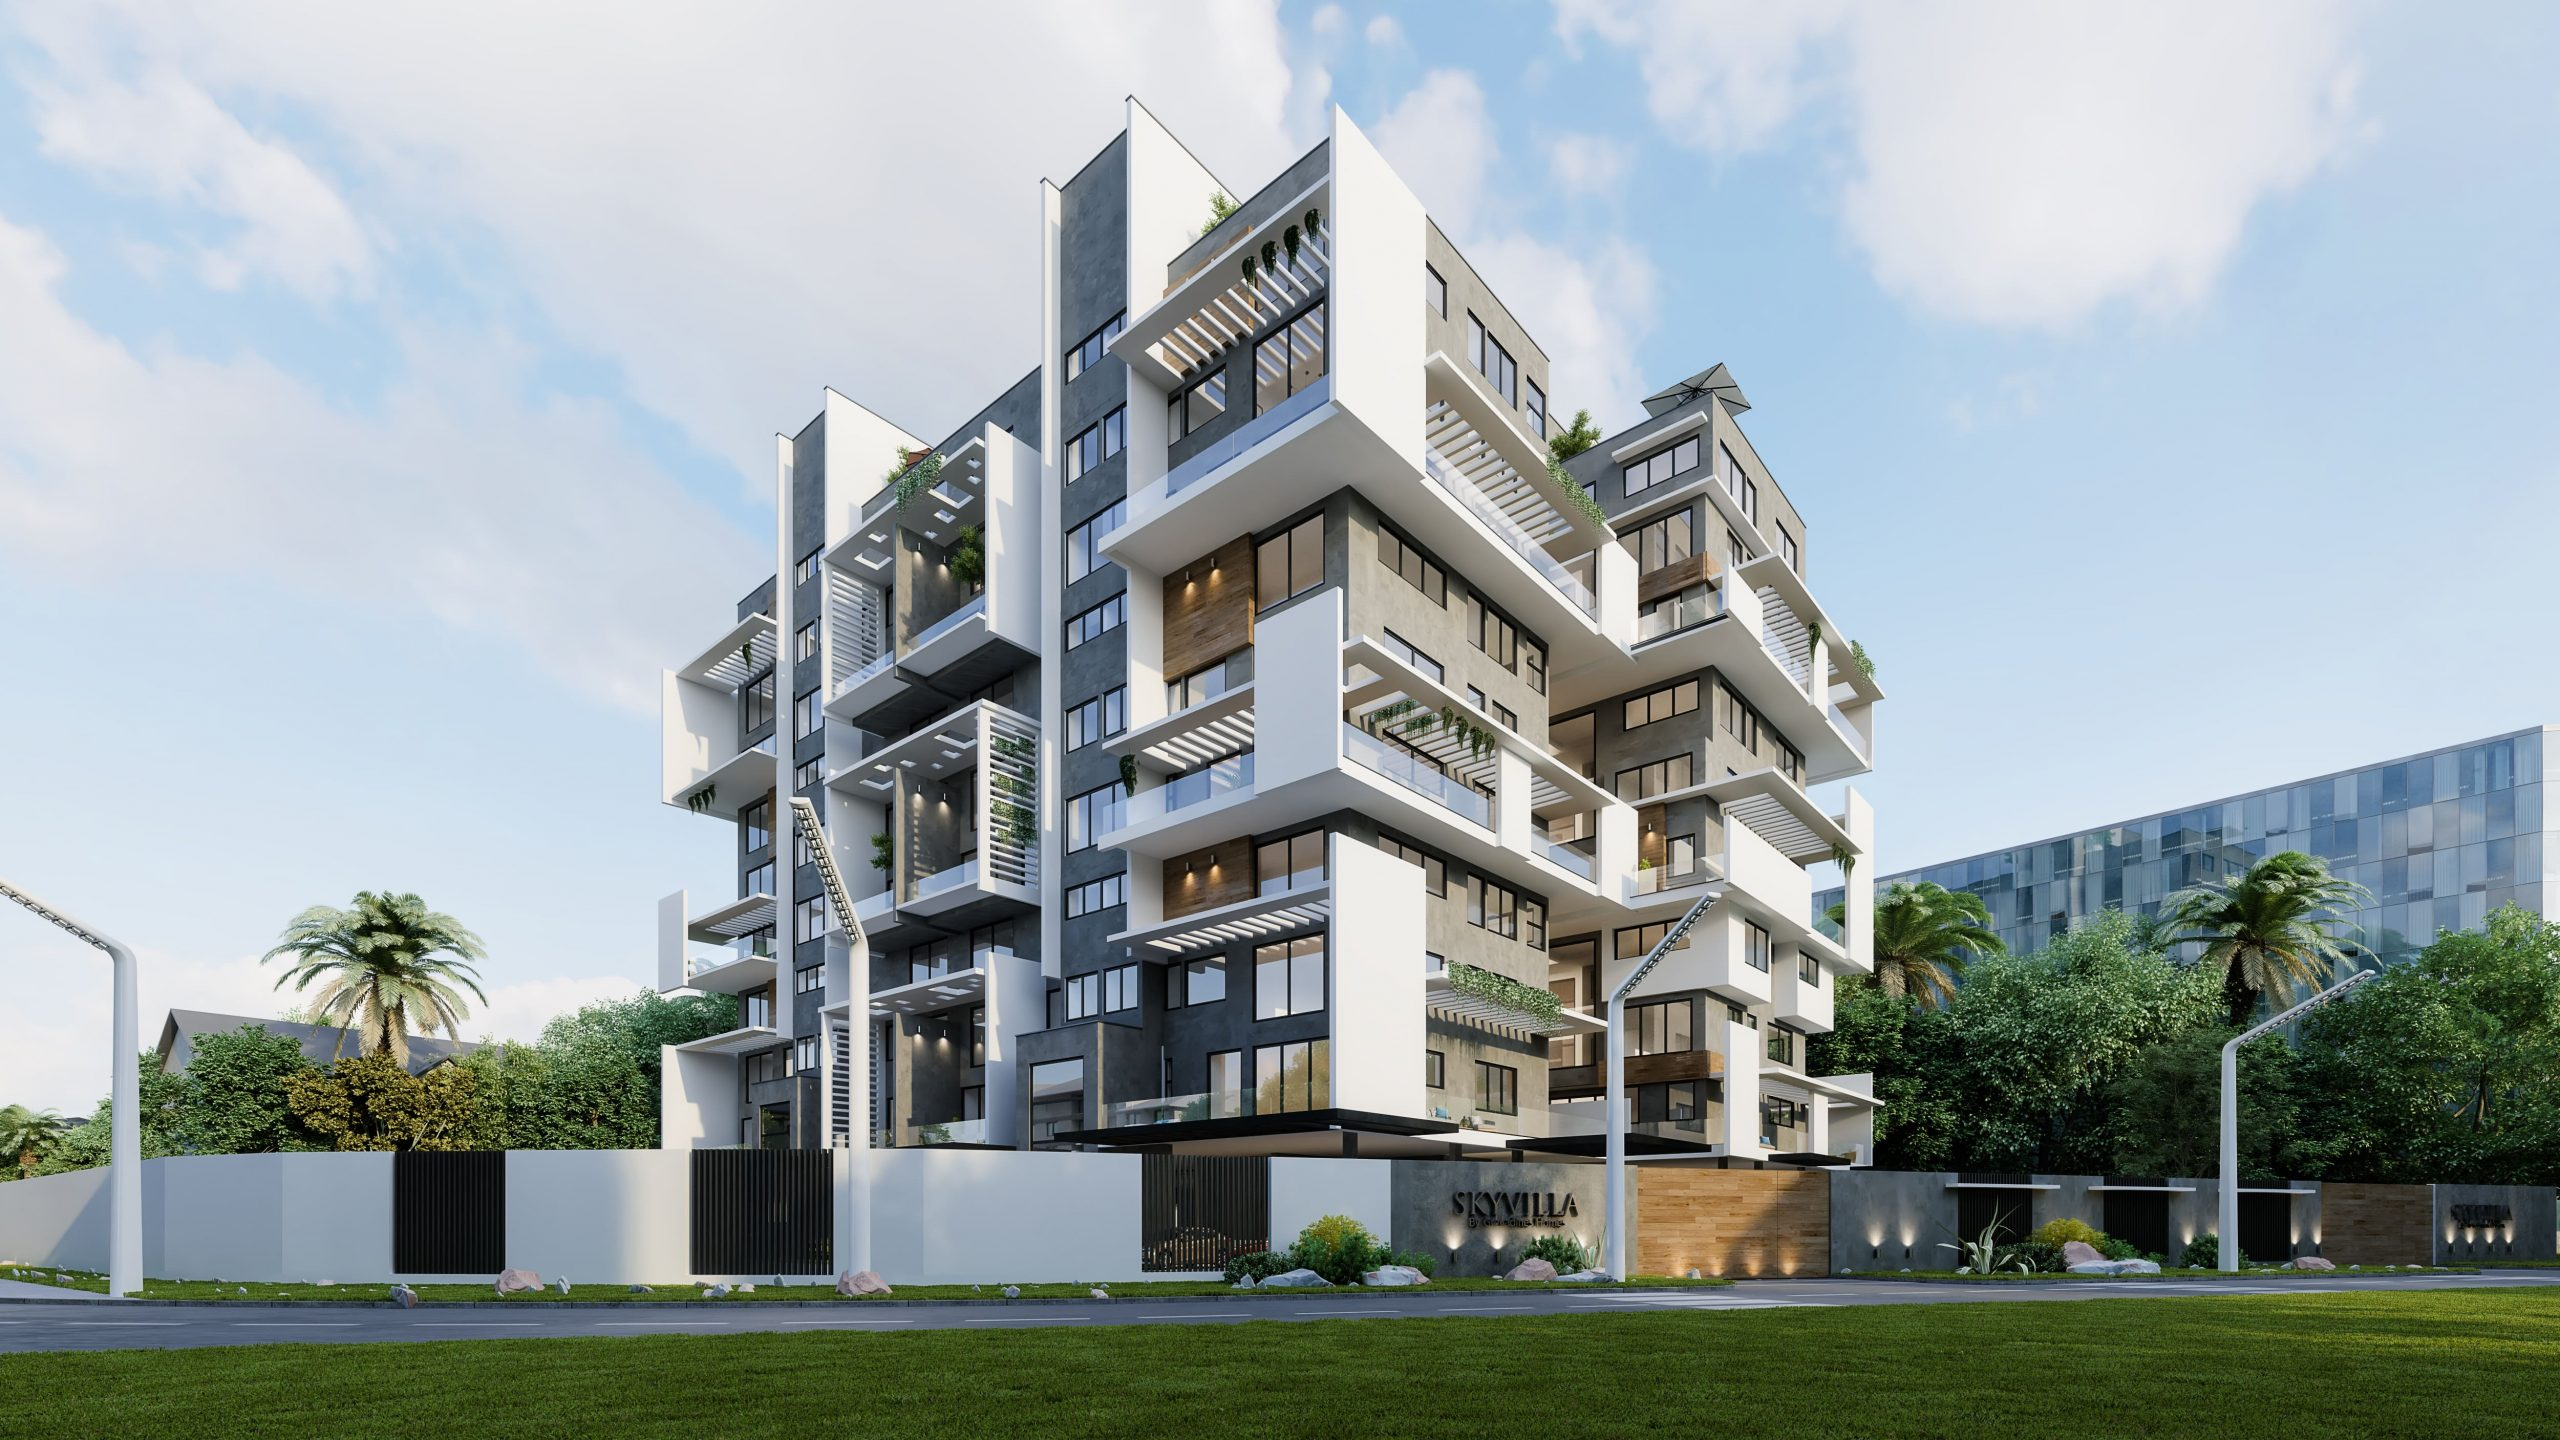 skyvilla-by-grenadines-homes